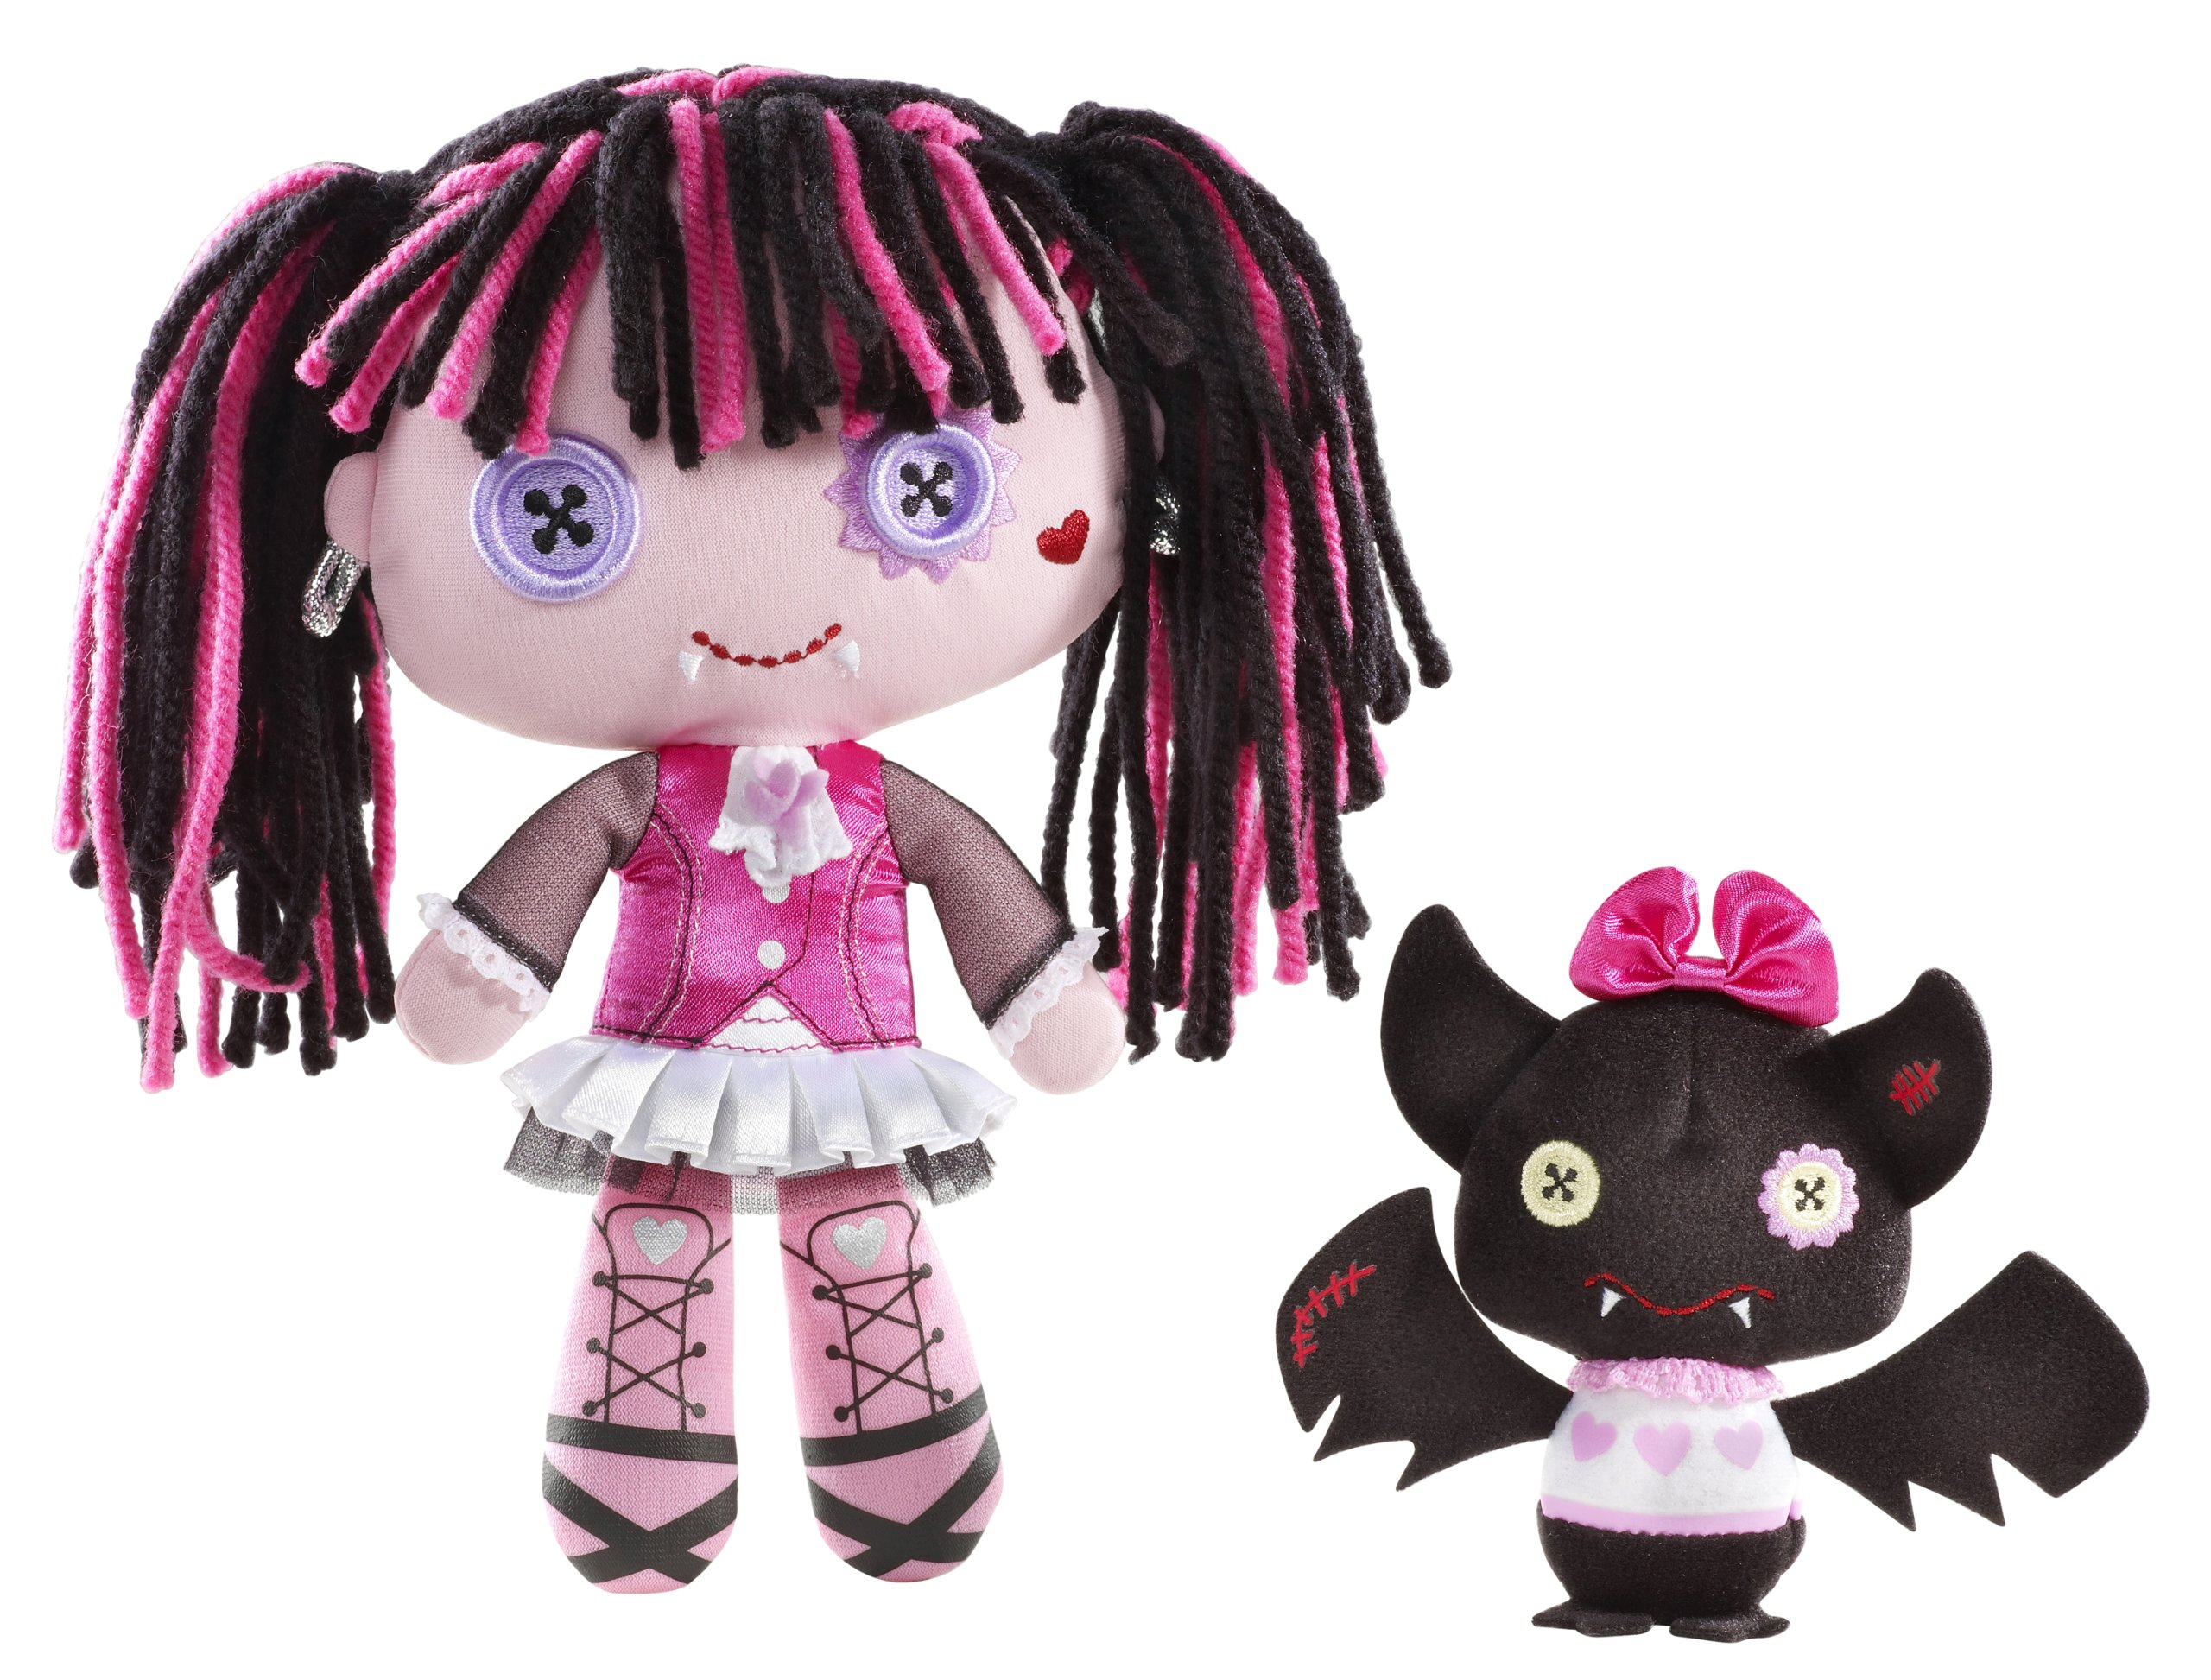 Monster High Friends Plush Draculaura Doll